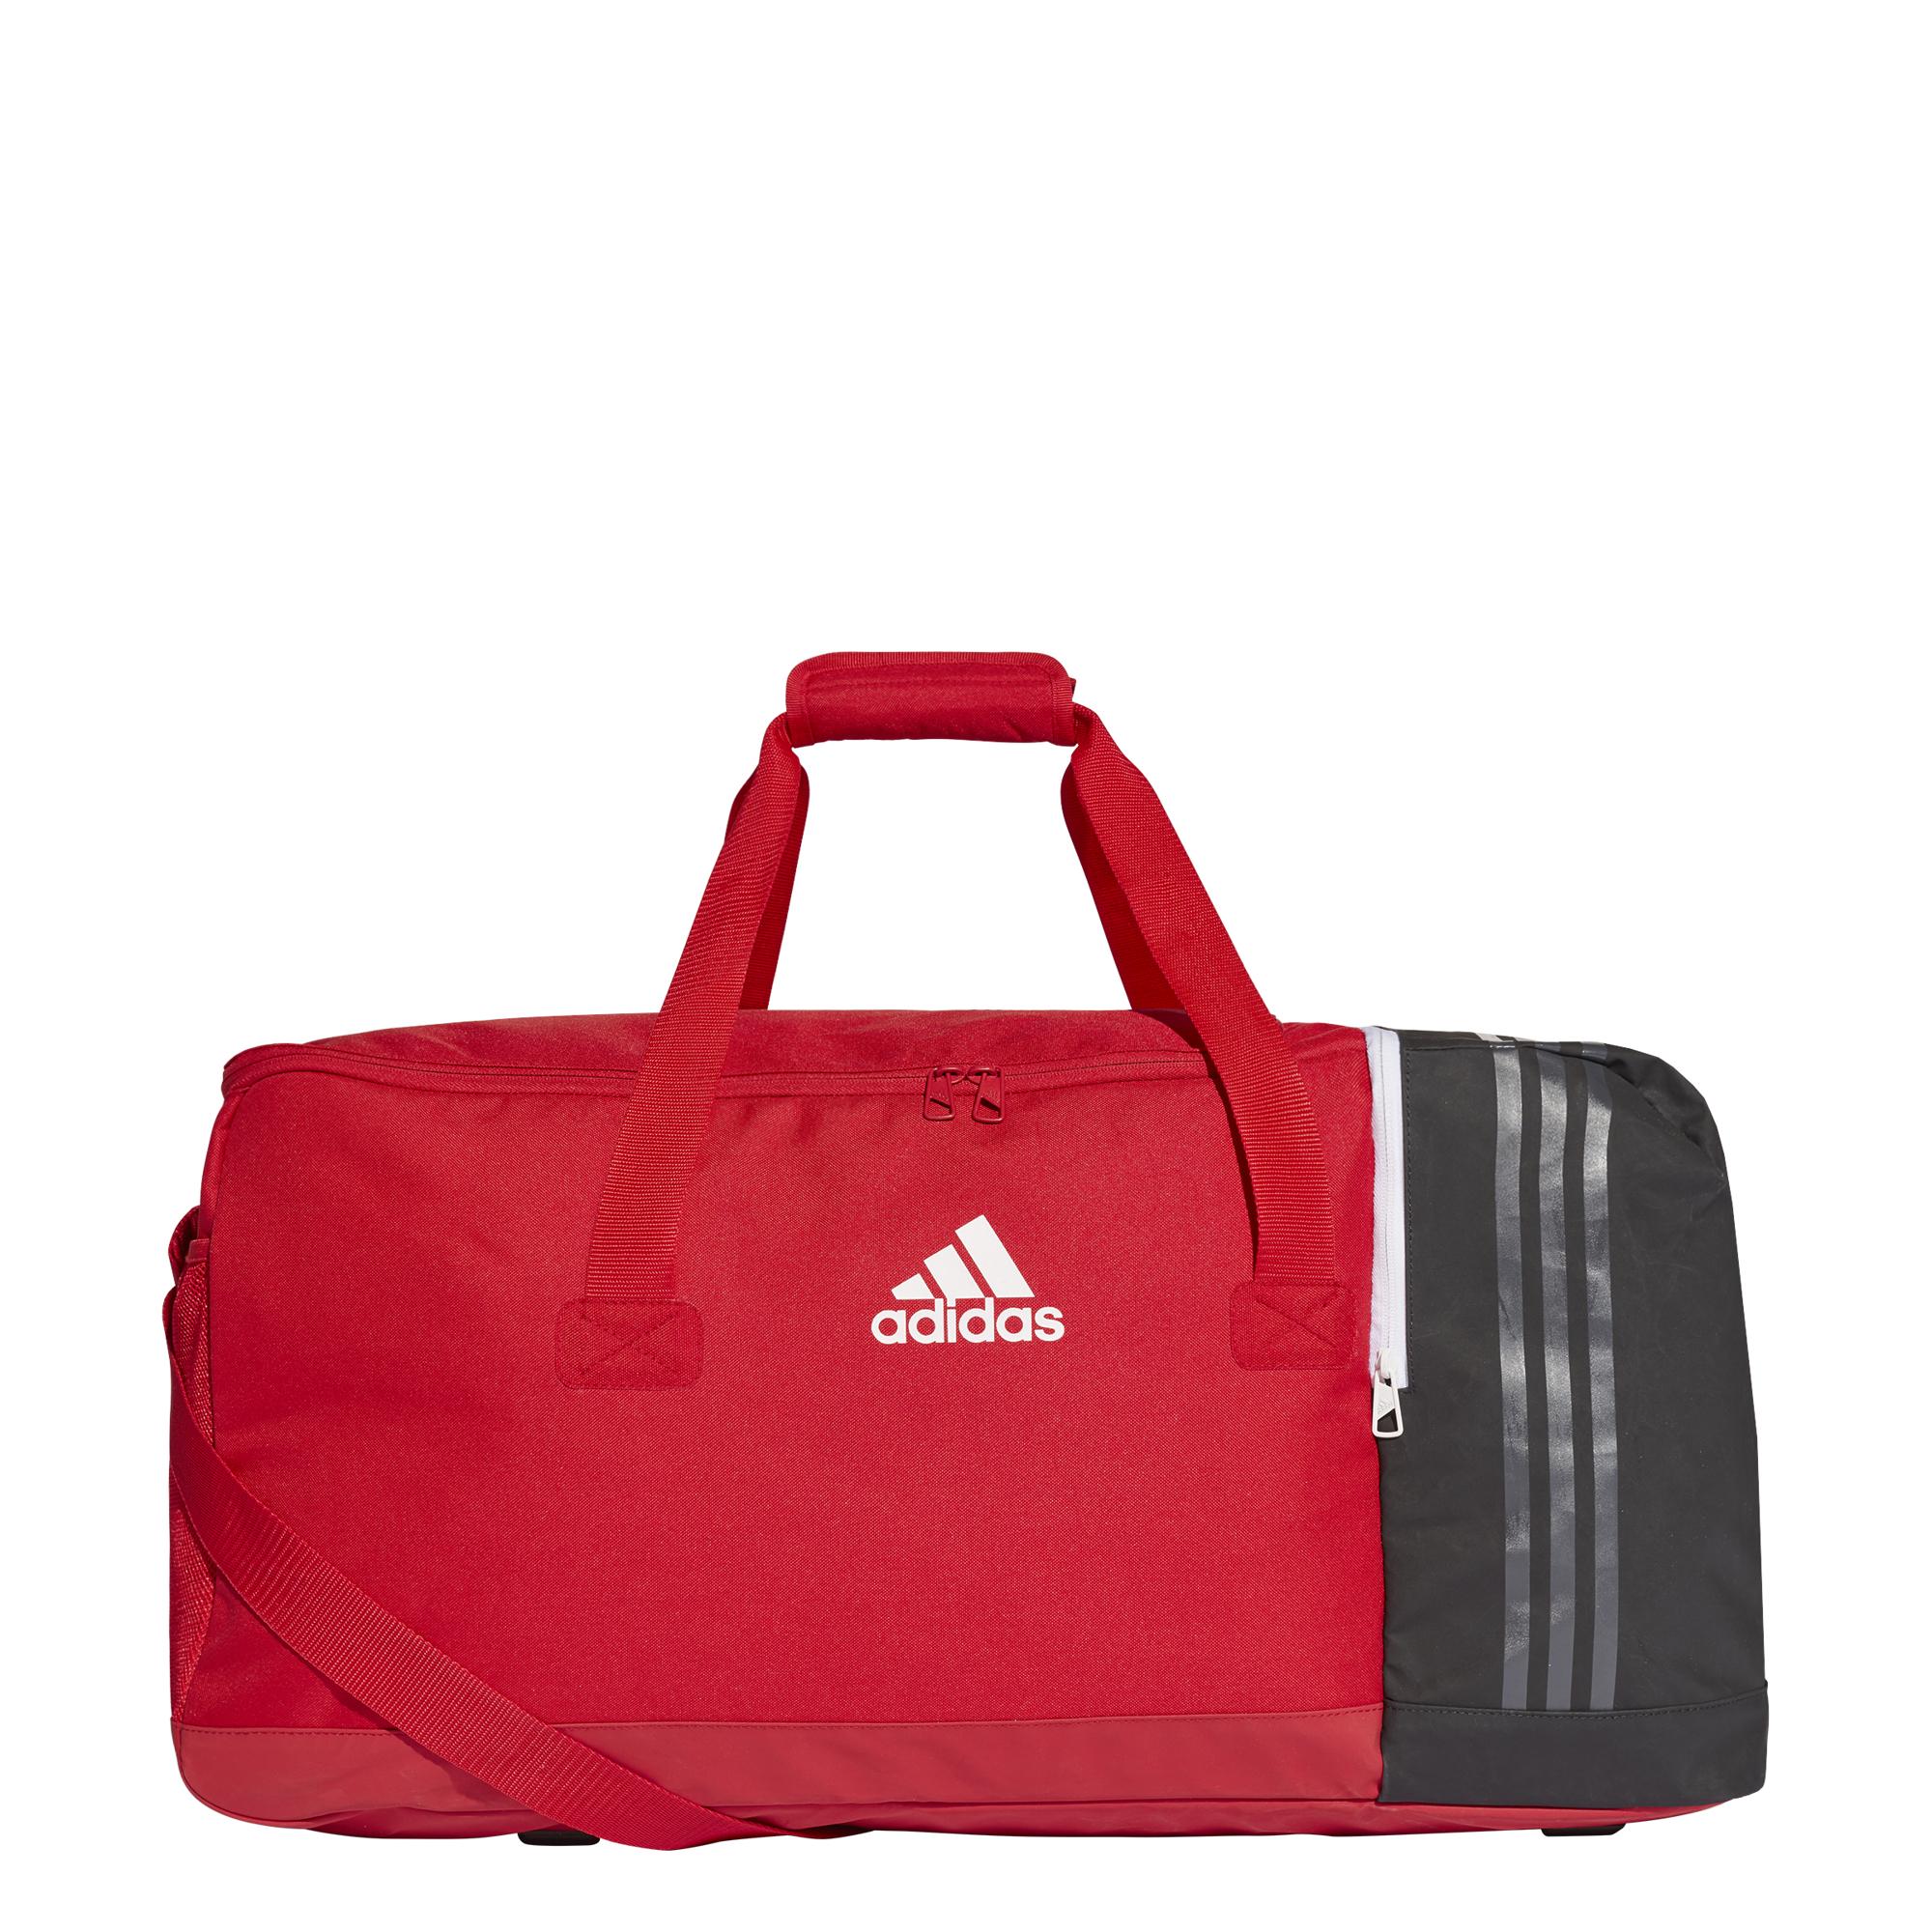 adidas Tiro Teambag - Large - Rot für 18,99€